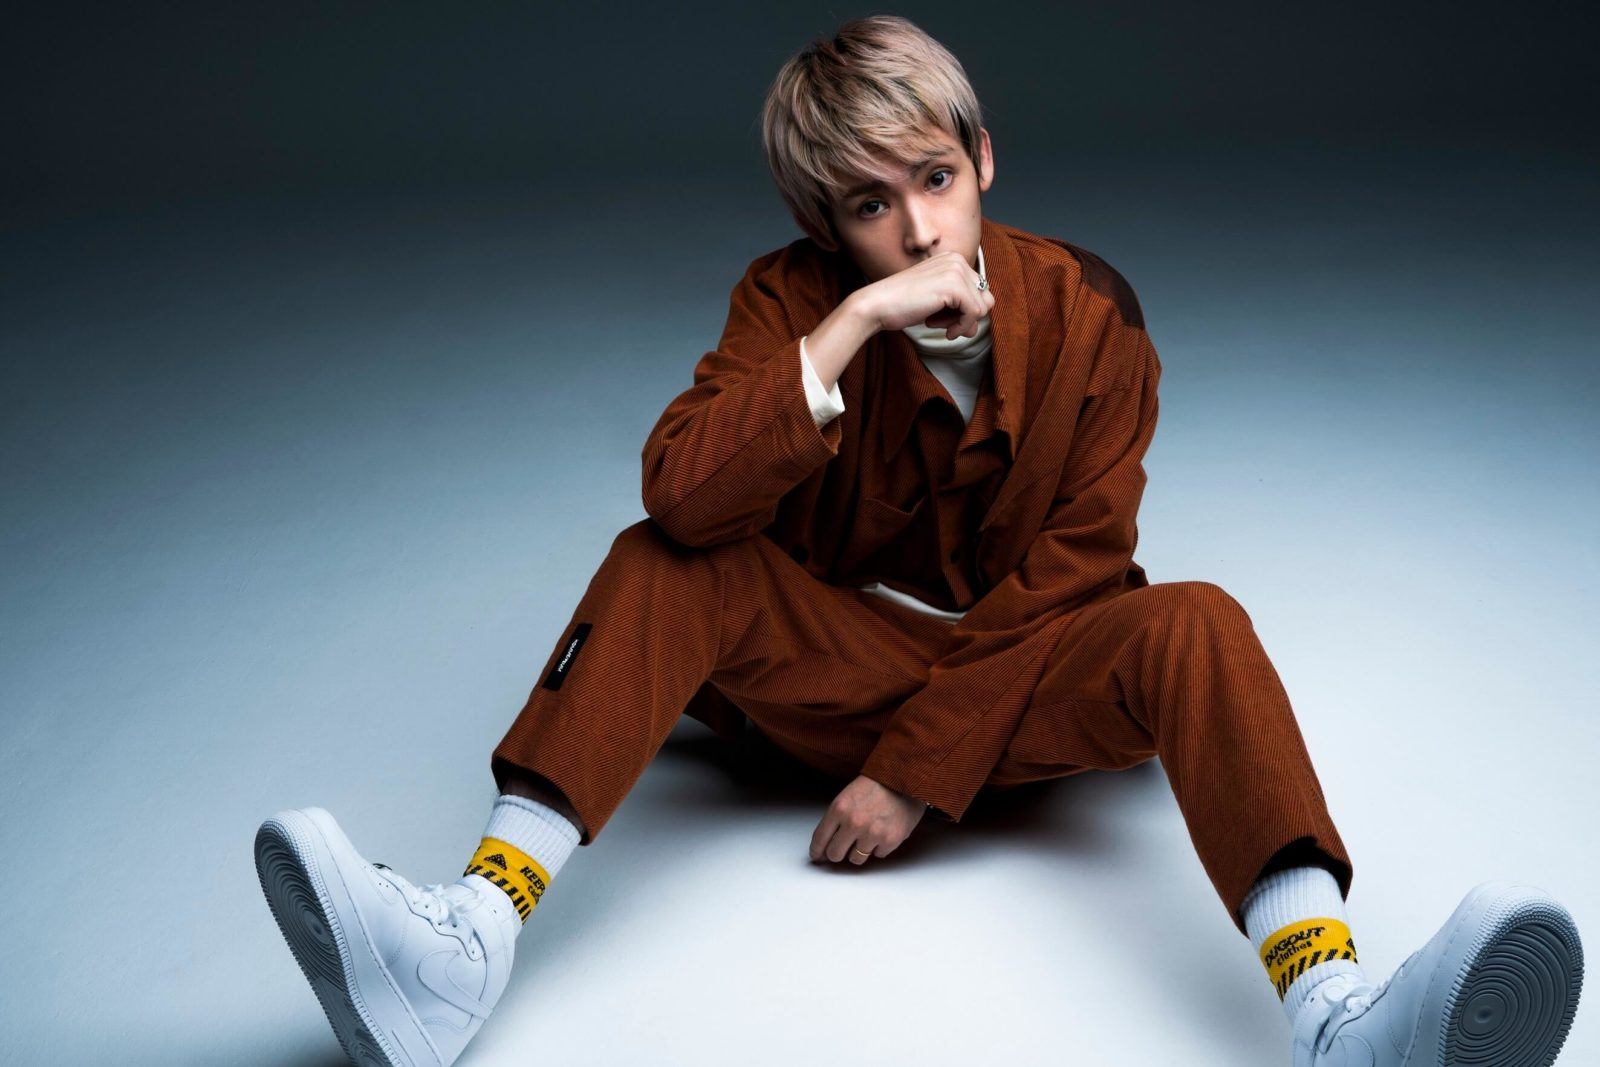 SALU、最新アルバム『GIFTED』リリース決定サムネイル画像